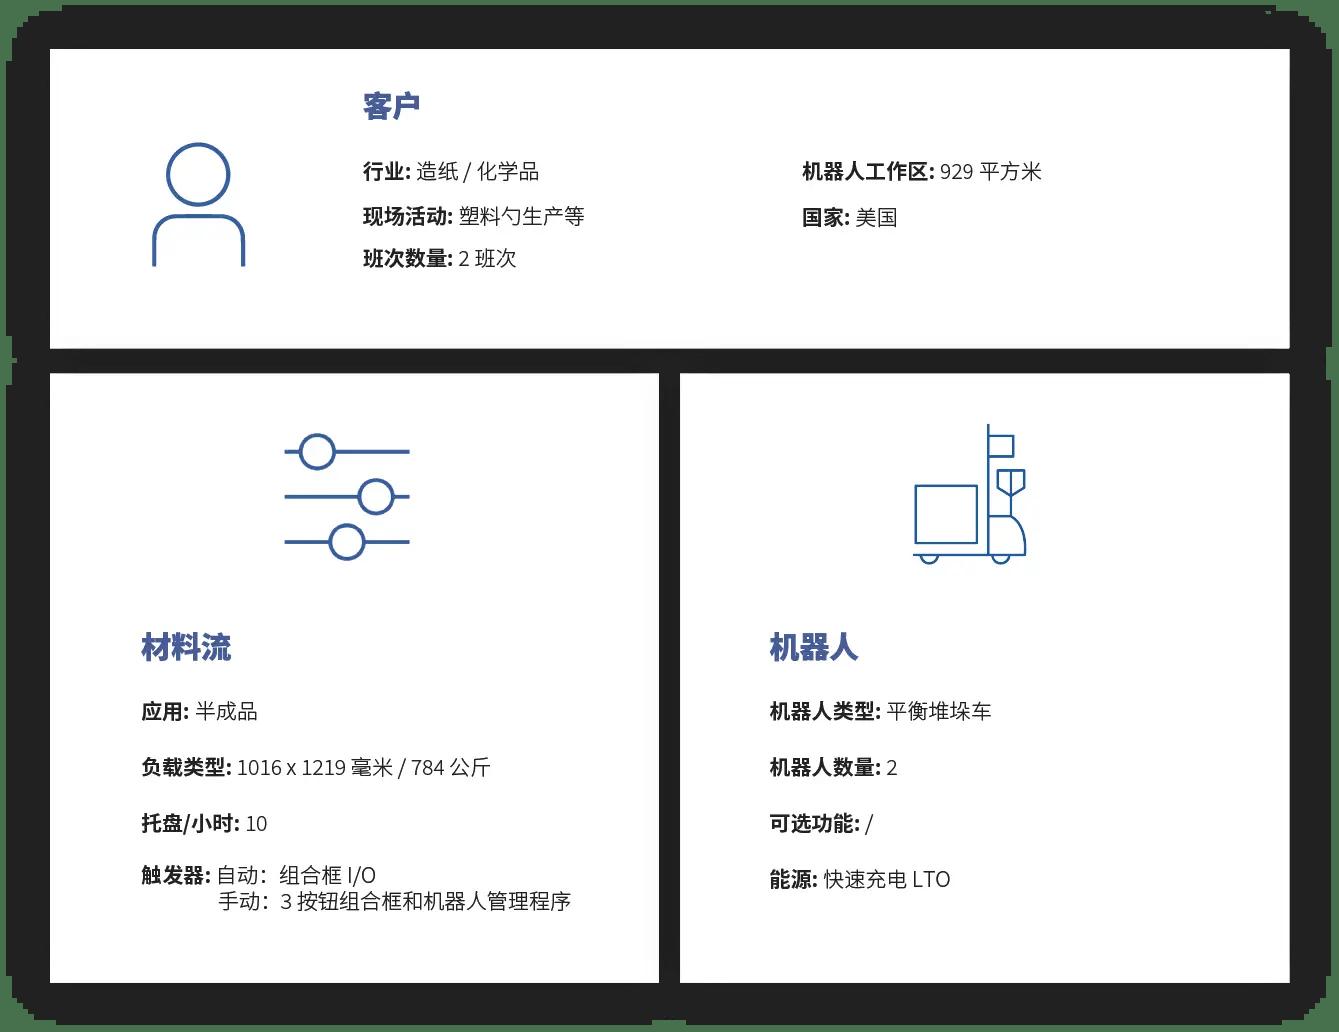 Case-study-Balyo-CN-9.Work-in-Progress-in-Paper-Chemical-1